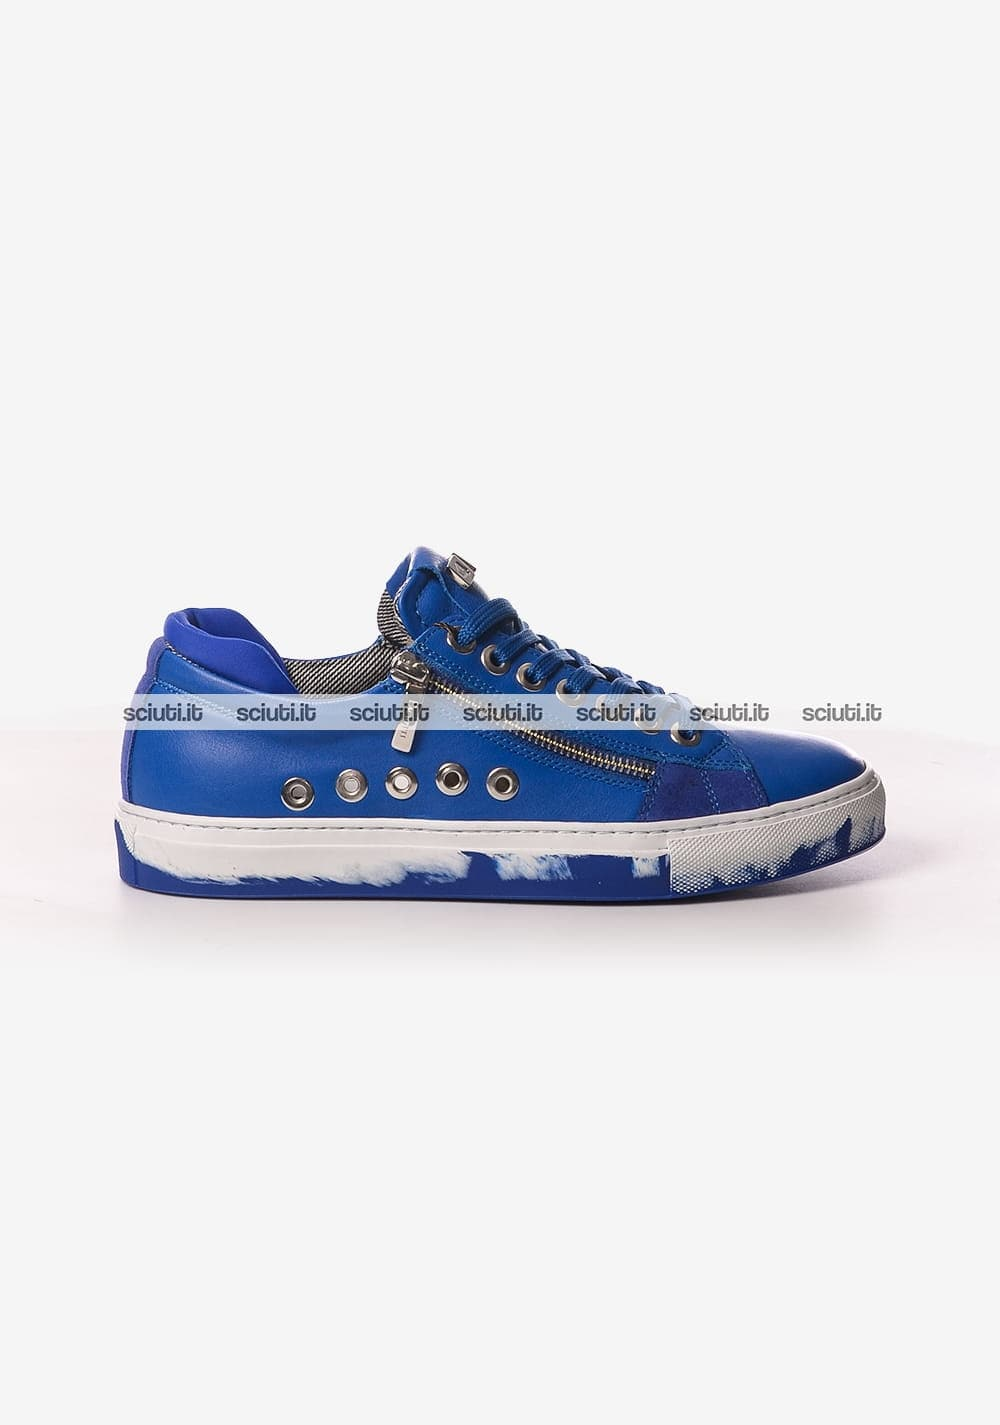 Ox8n0wpk Scarpe It Paciotti Uomo 4us Blu Sneakers Ramones Cesare Sciuti wPXkiTZlOu